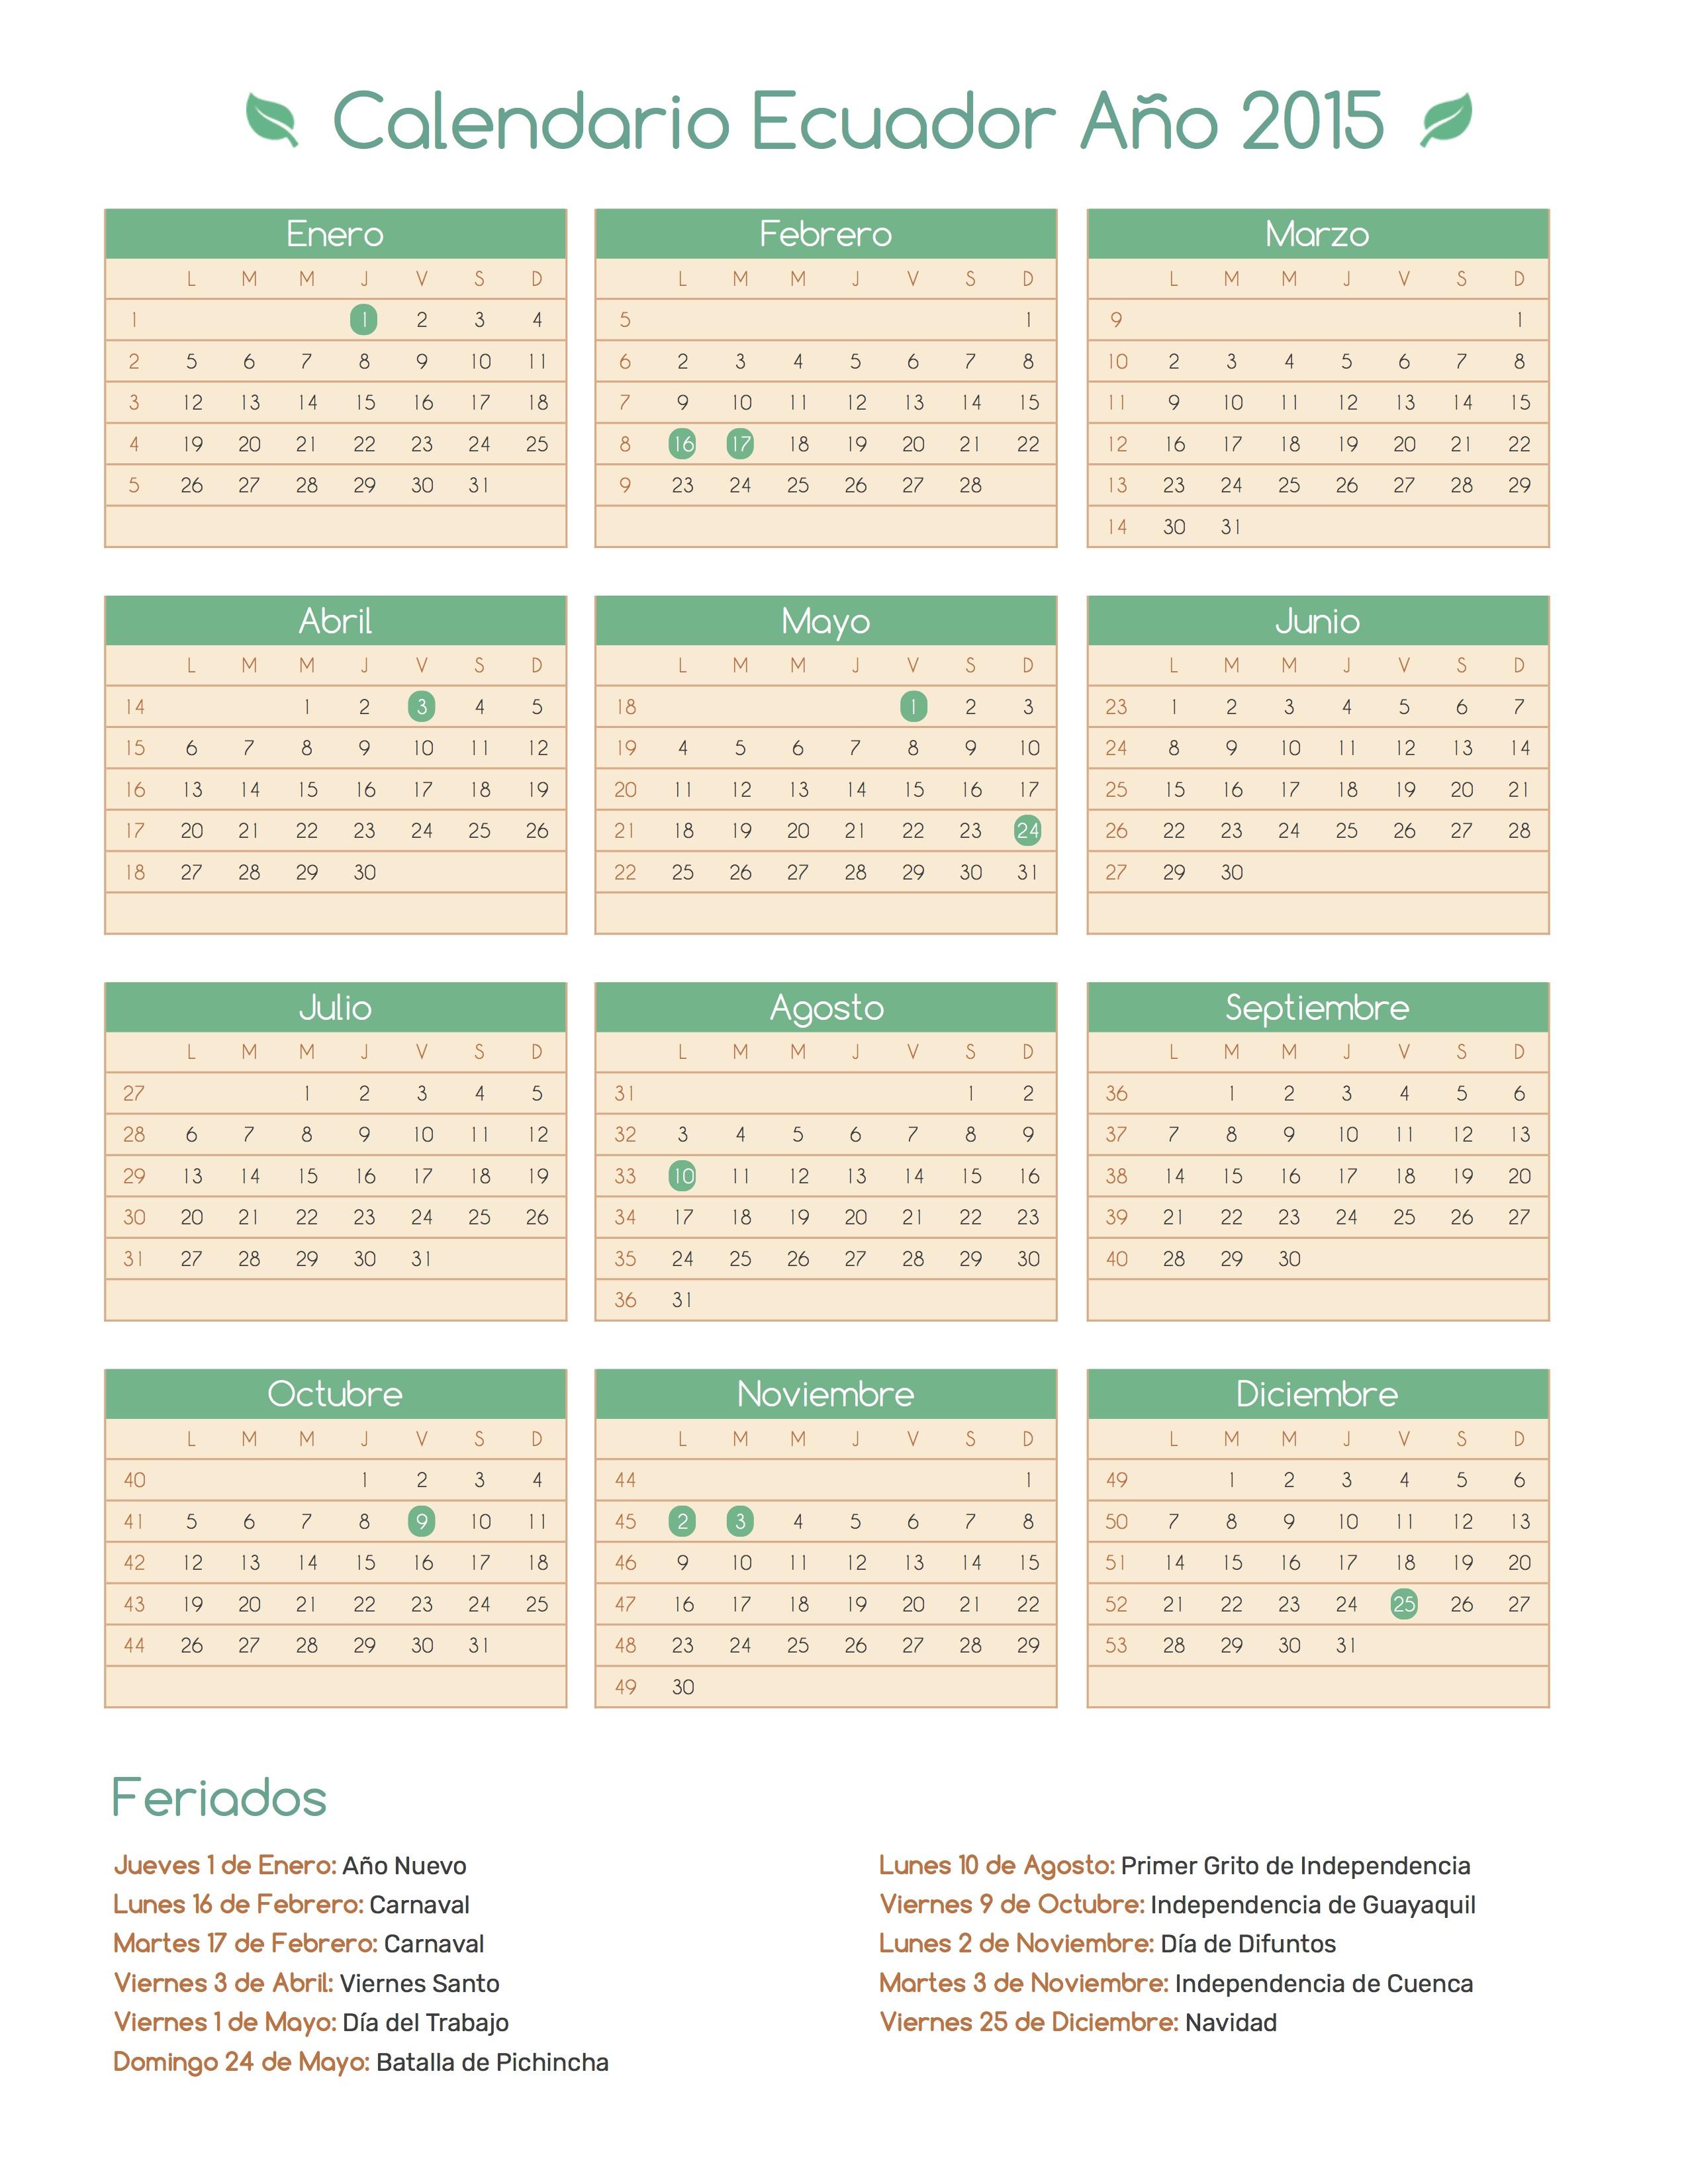 calendario ecuador a u00f1o 2015